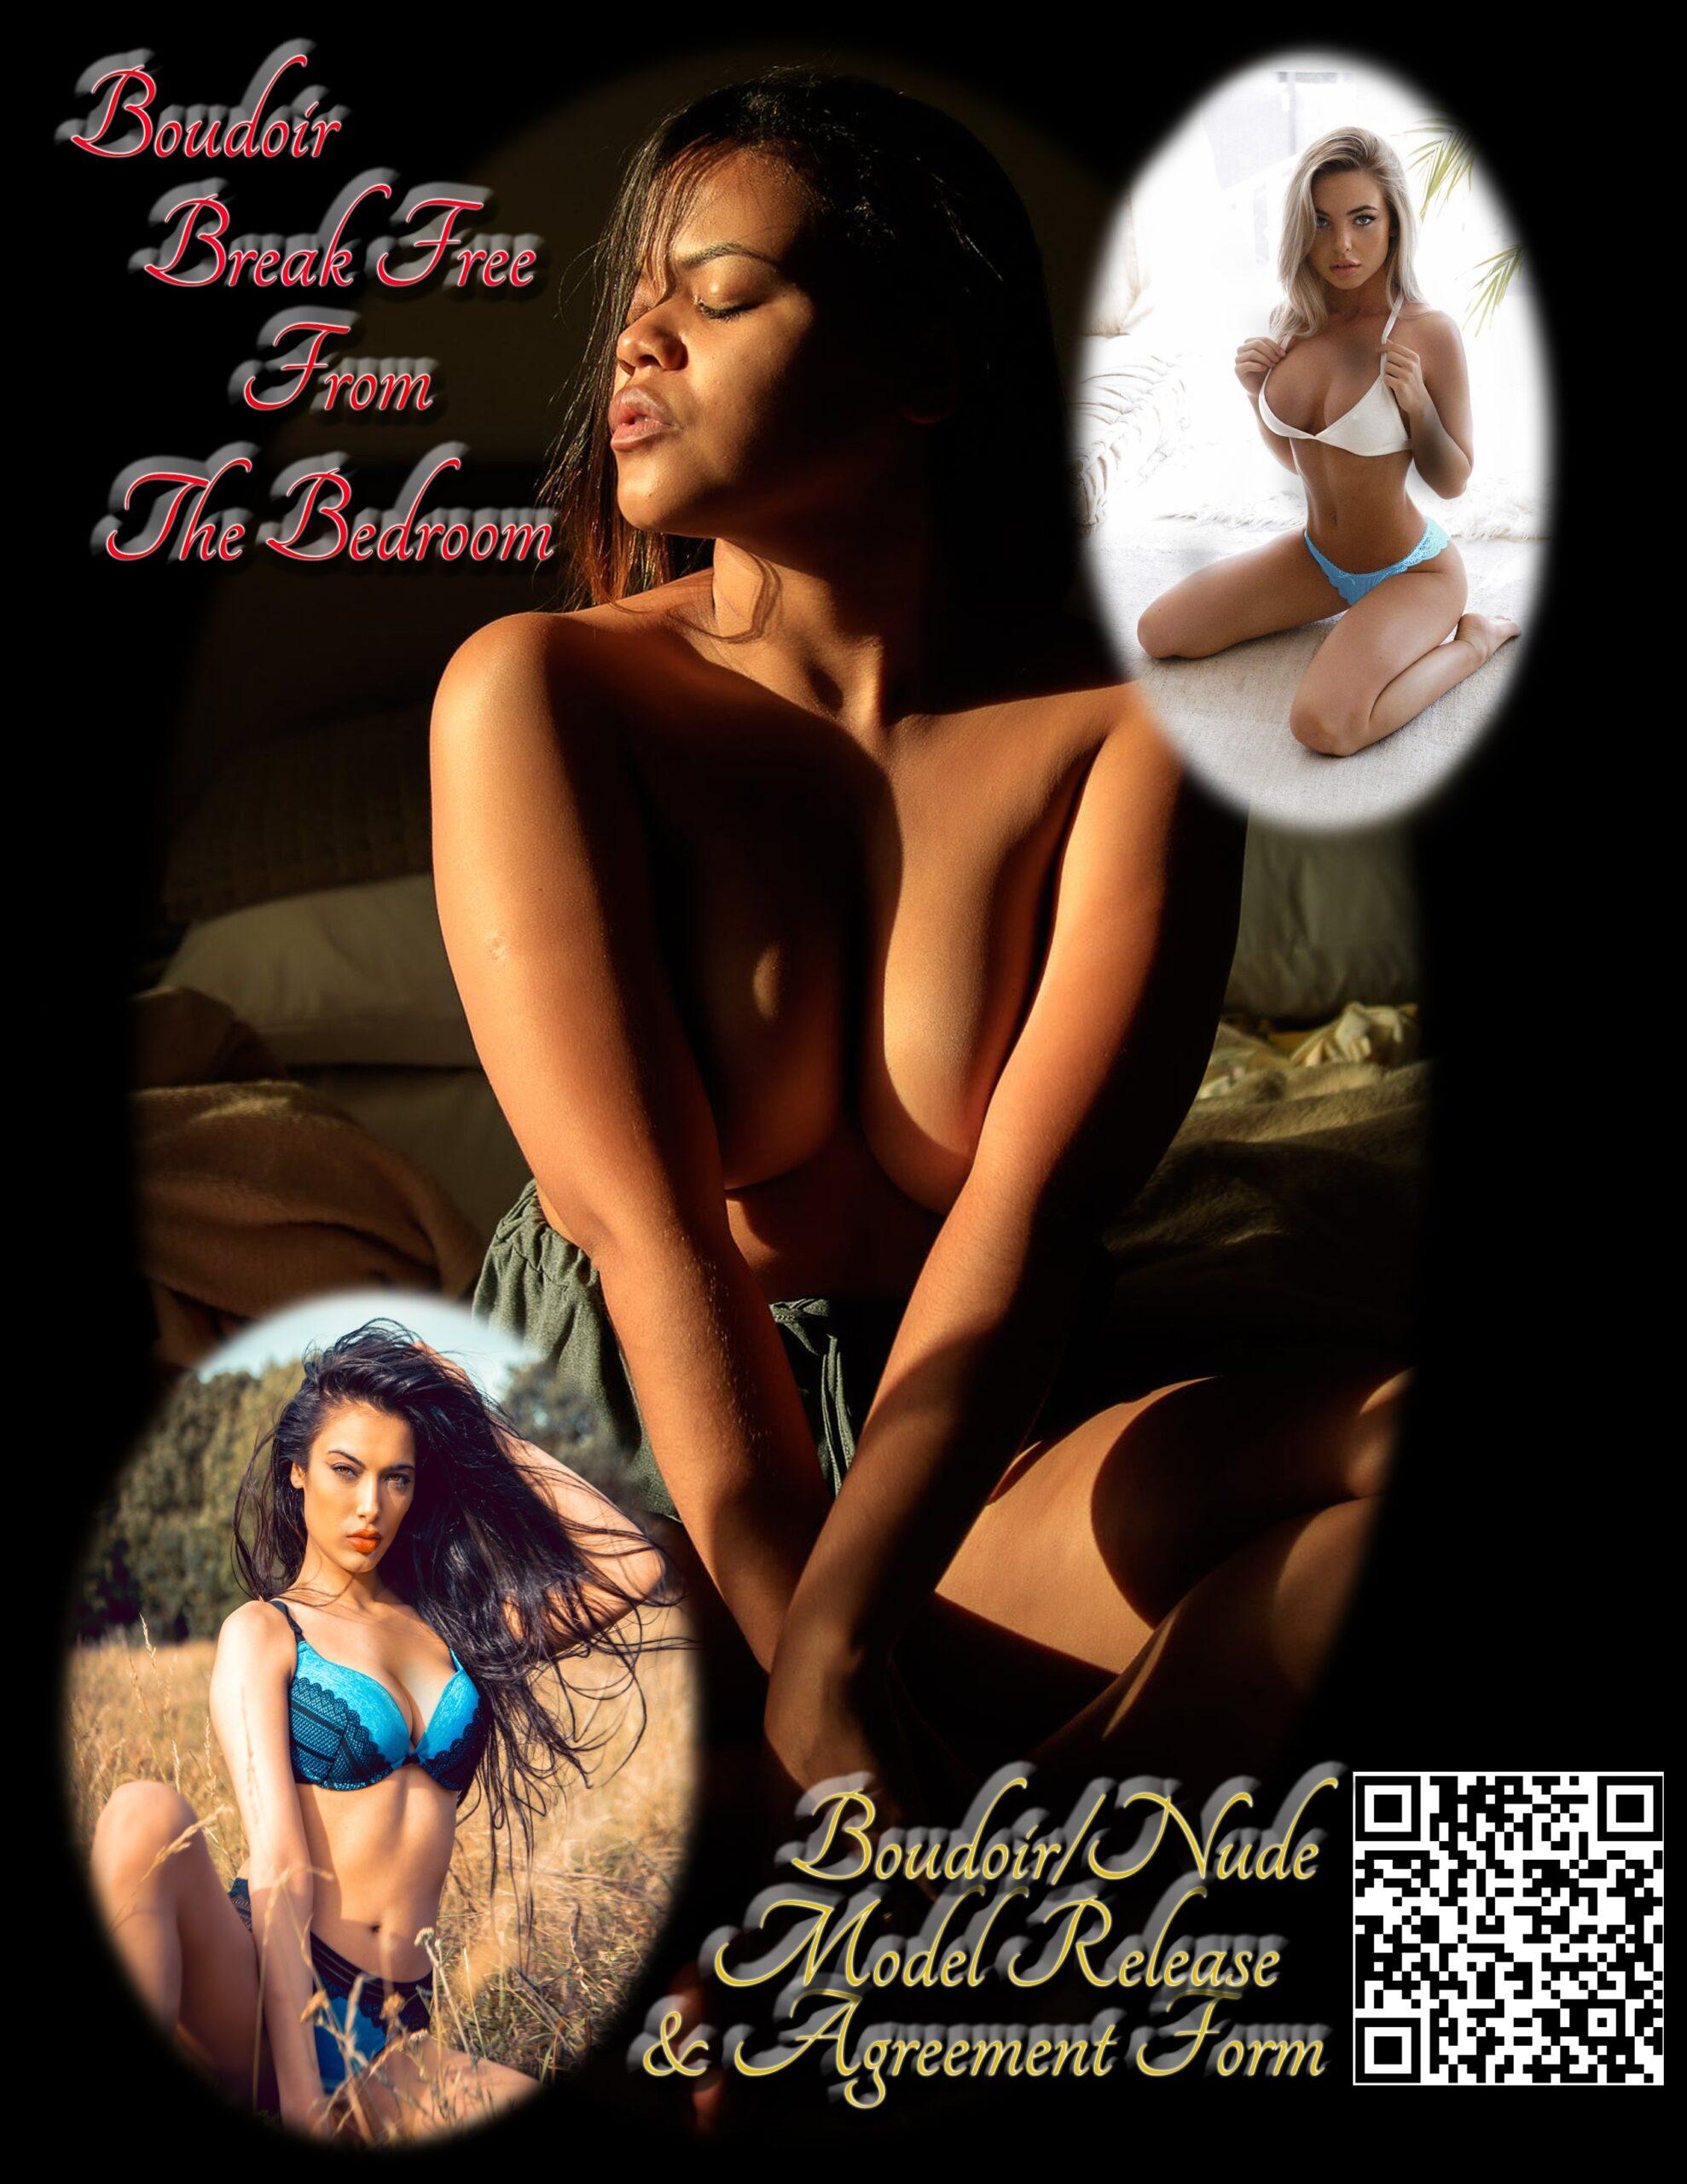 Boudoir/Nude Model Release & Agreement Form